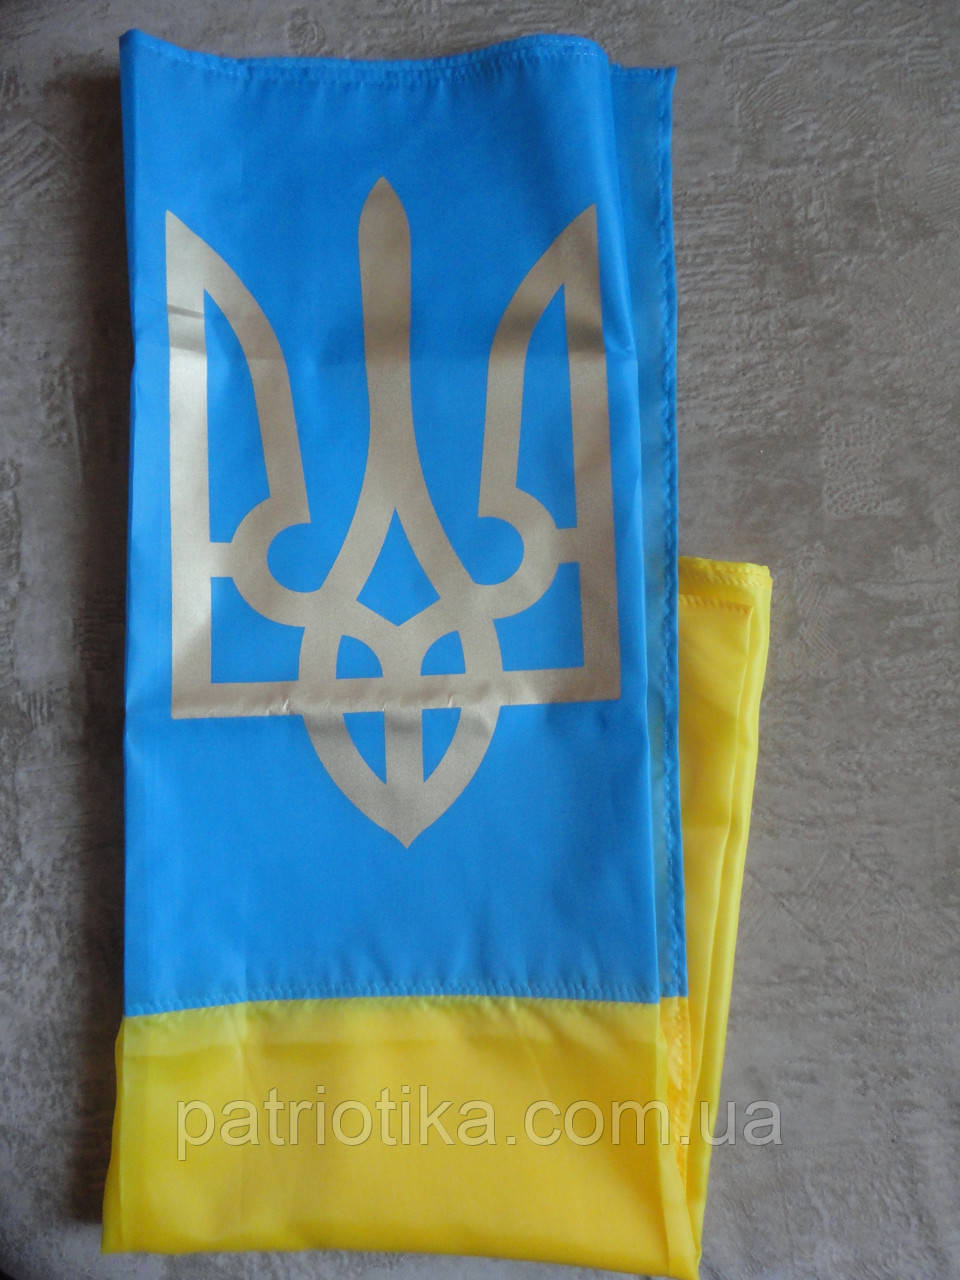 Флаг Украины | Прапор України тризуб 145х220 см полиэстер